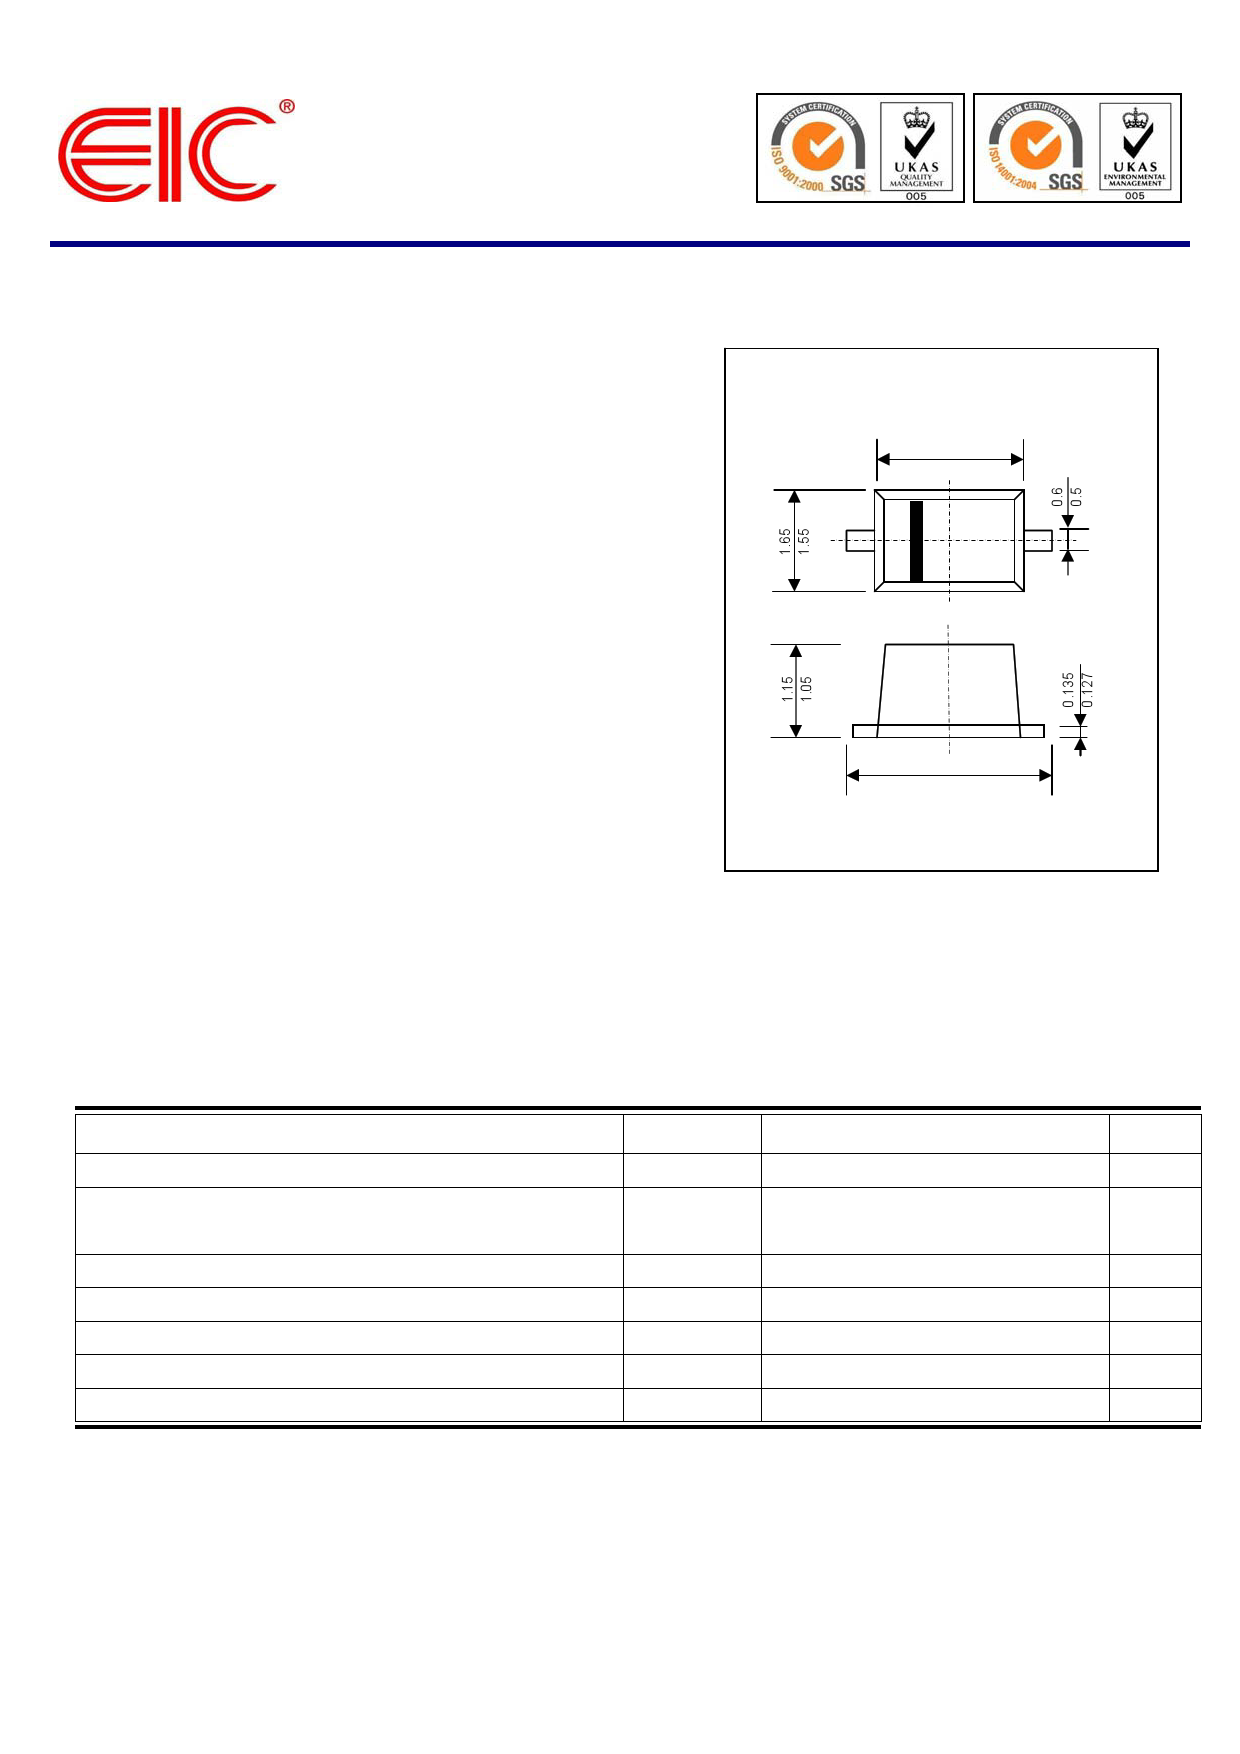 MMSZ5263B Datasheet